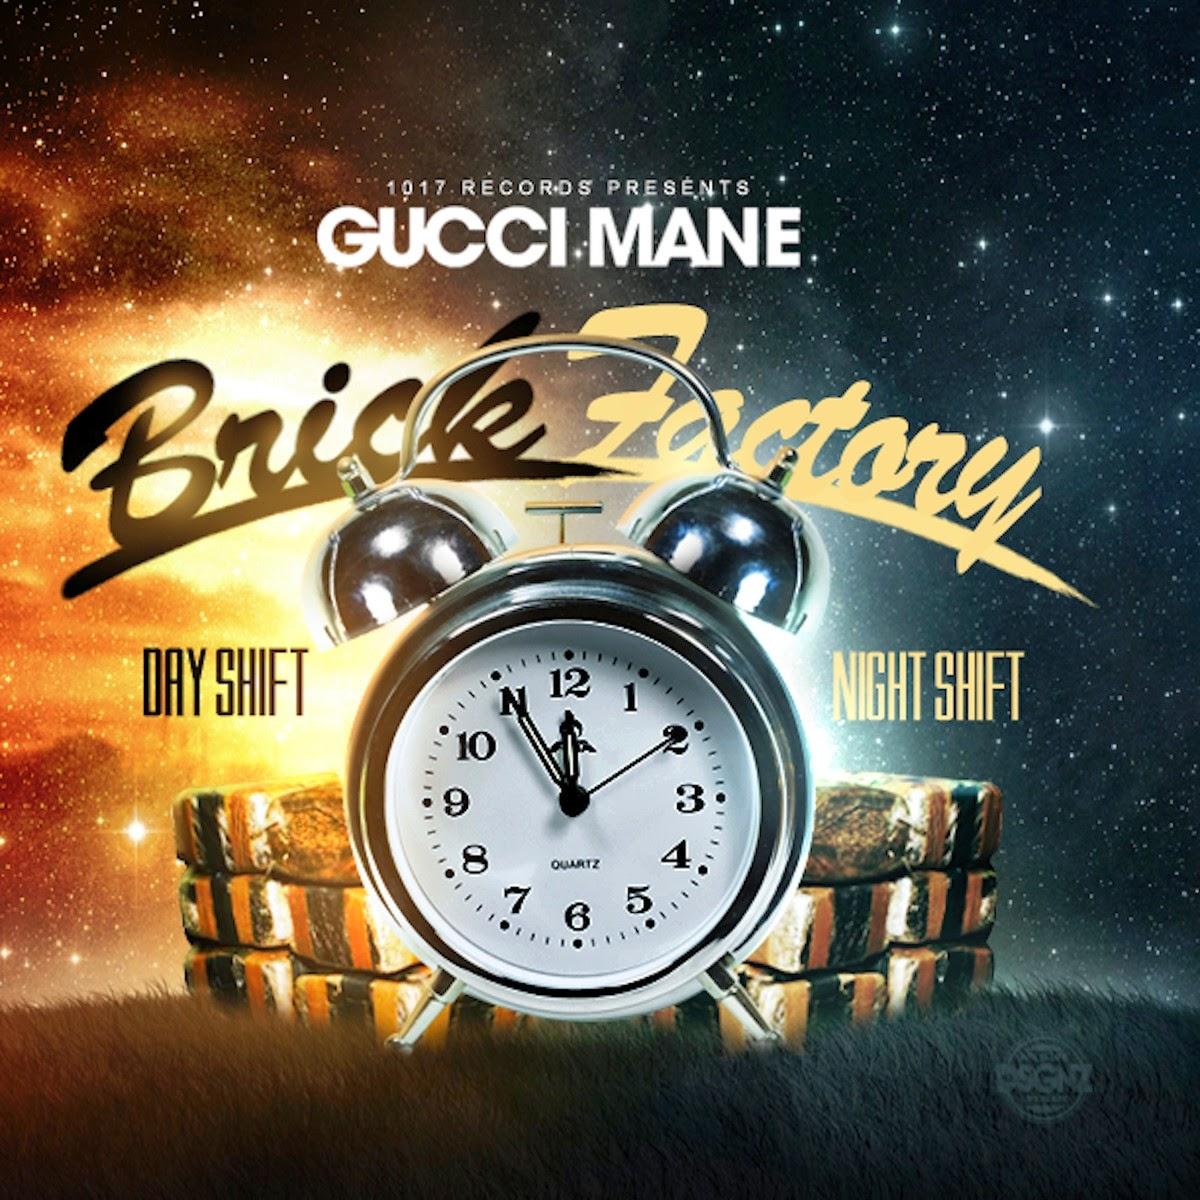 Gucci Mane - Brick Factory Vol 2 Cover